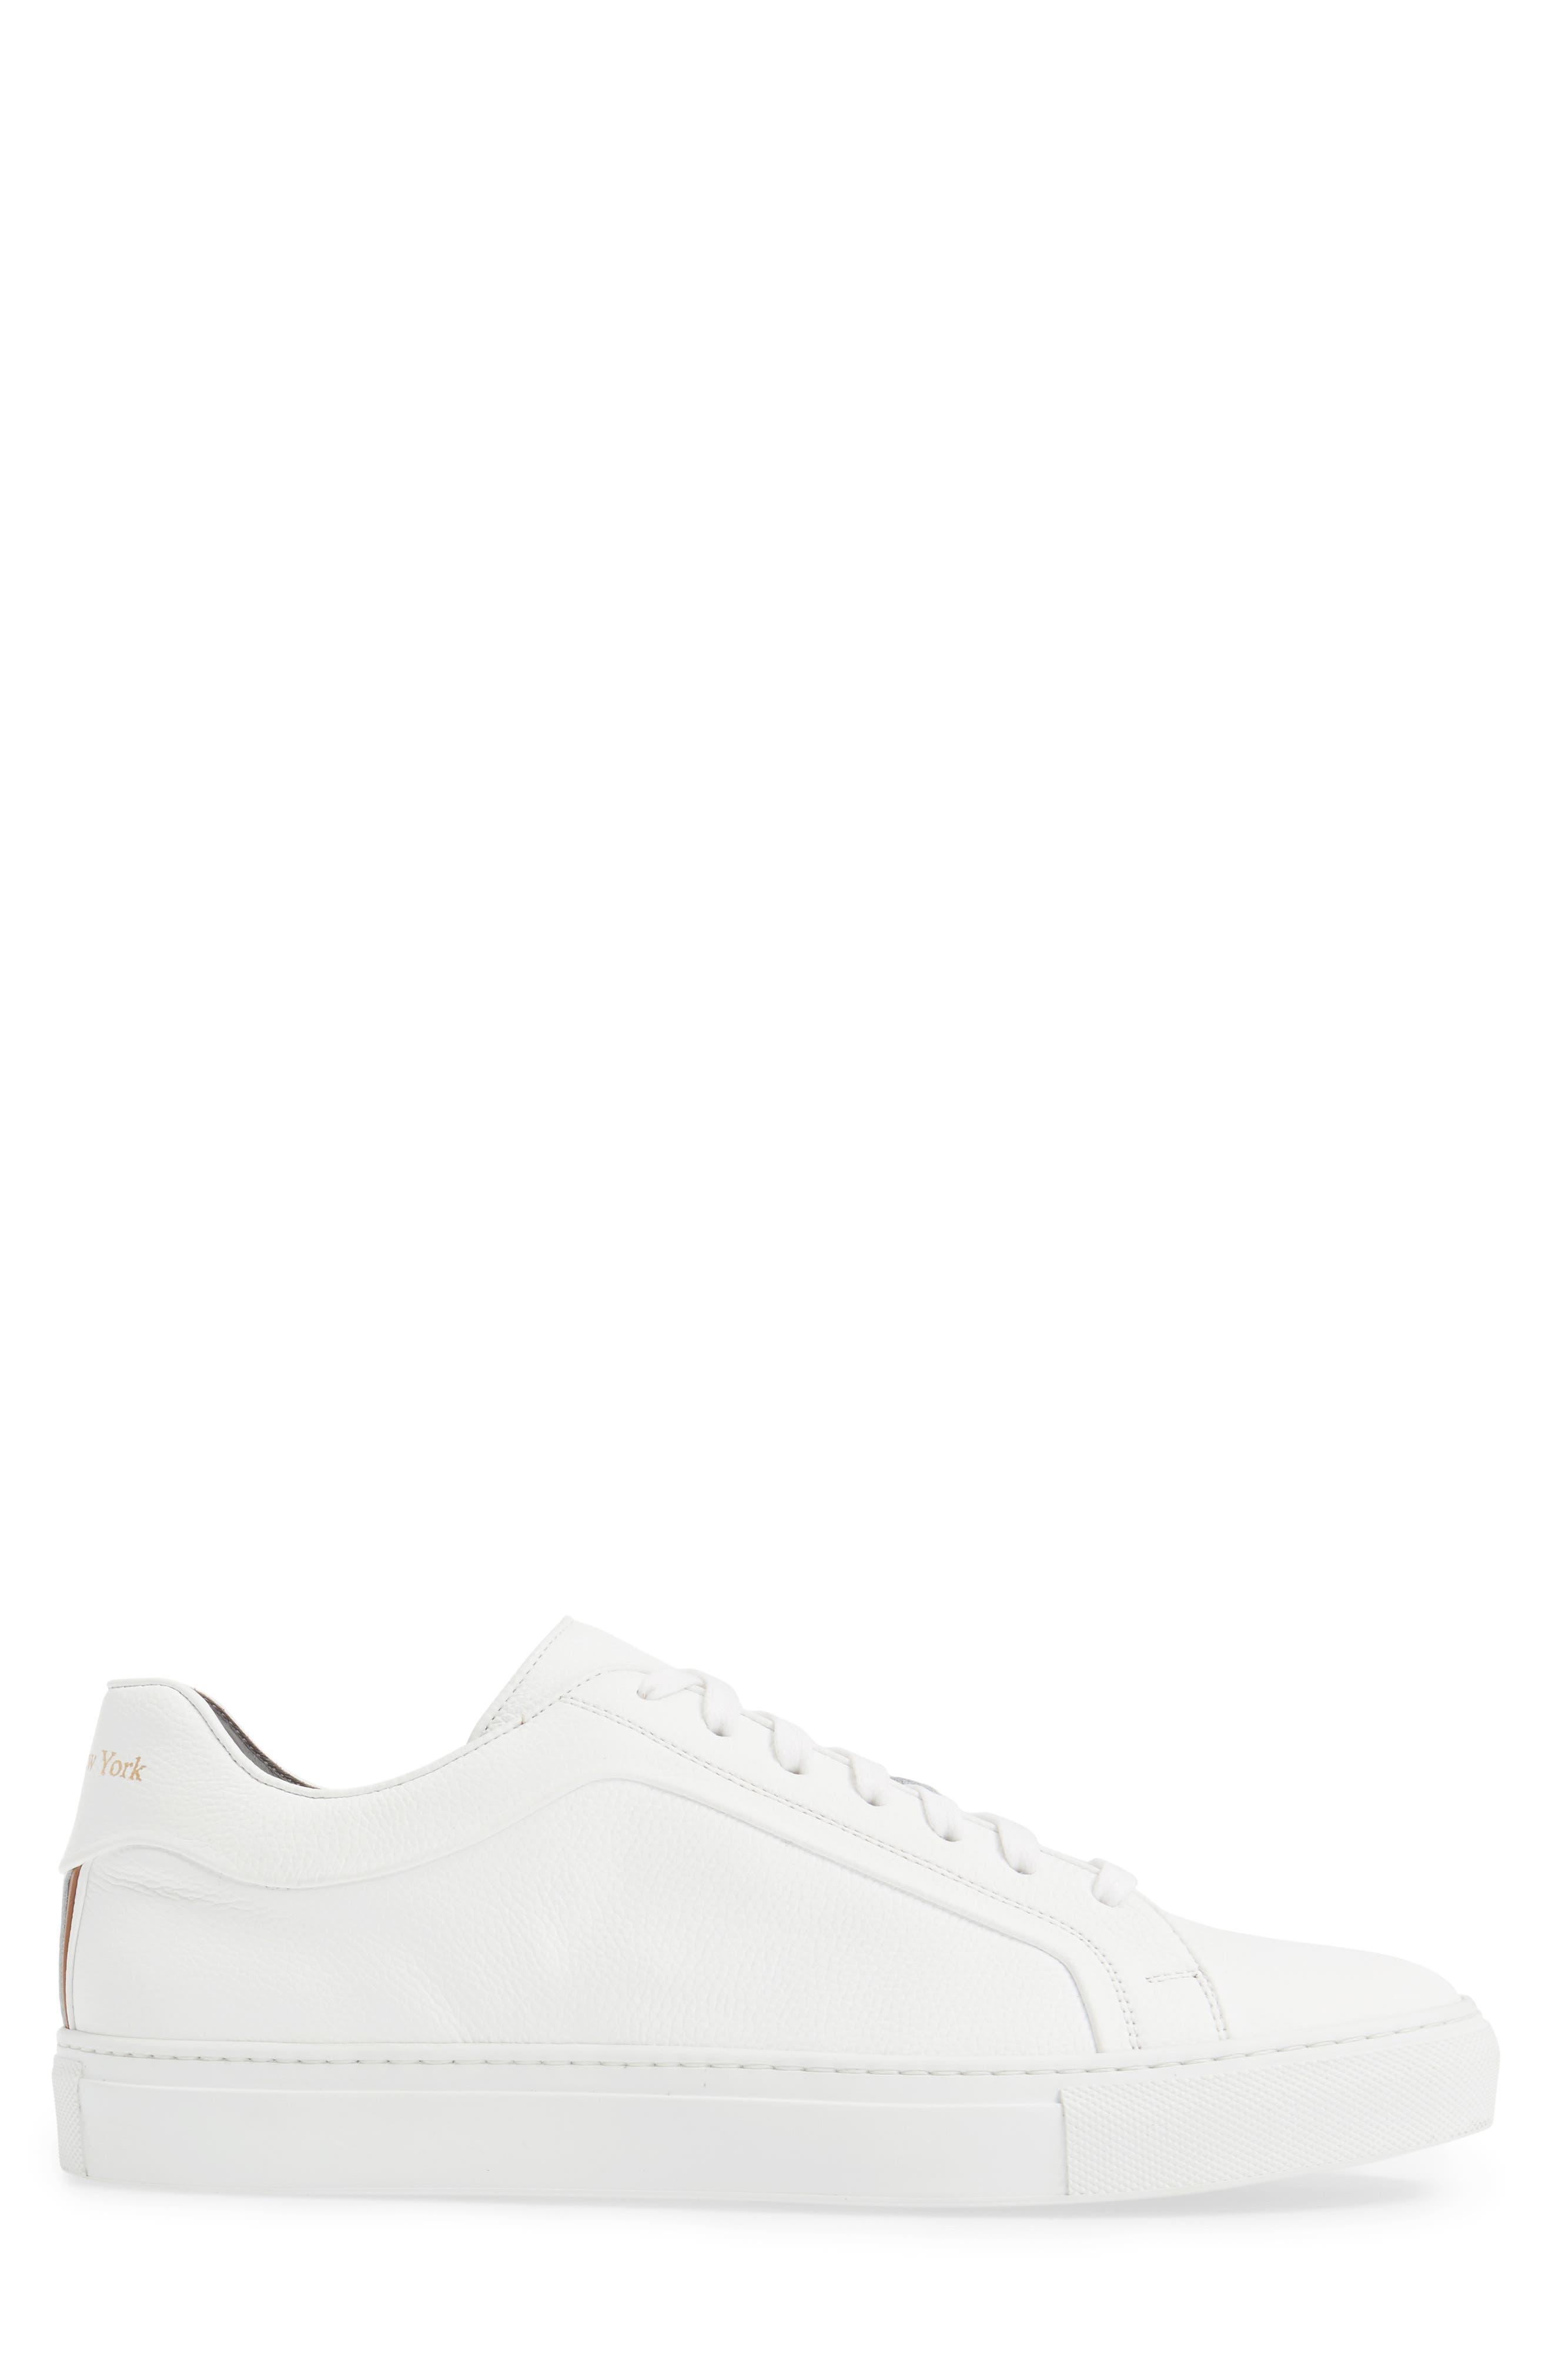 Alternate Image 3  - To Boot New York Thomas Sneaker (Men)